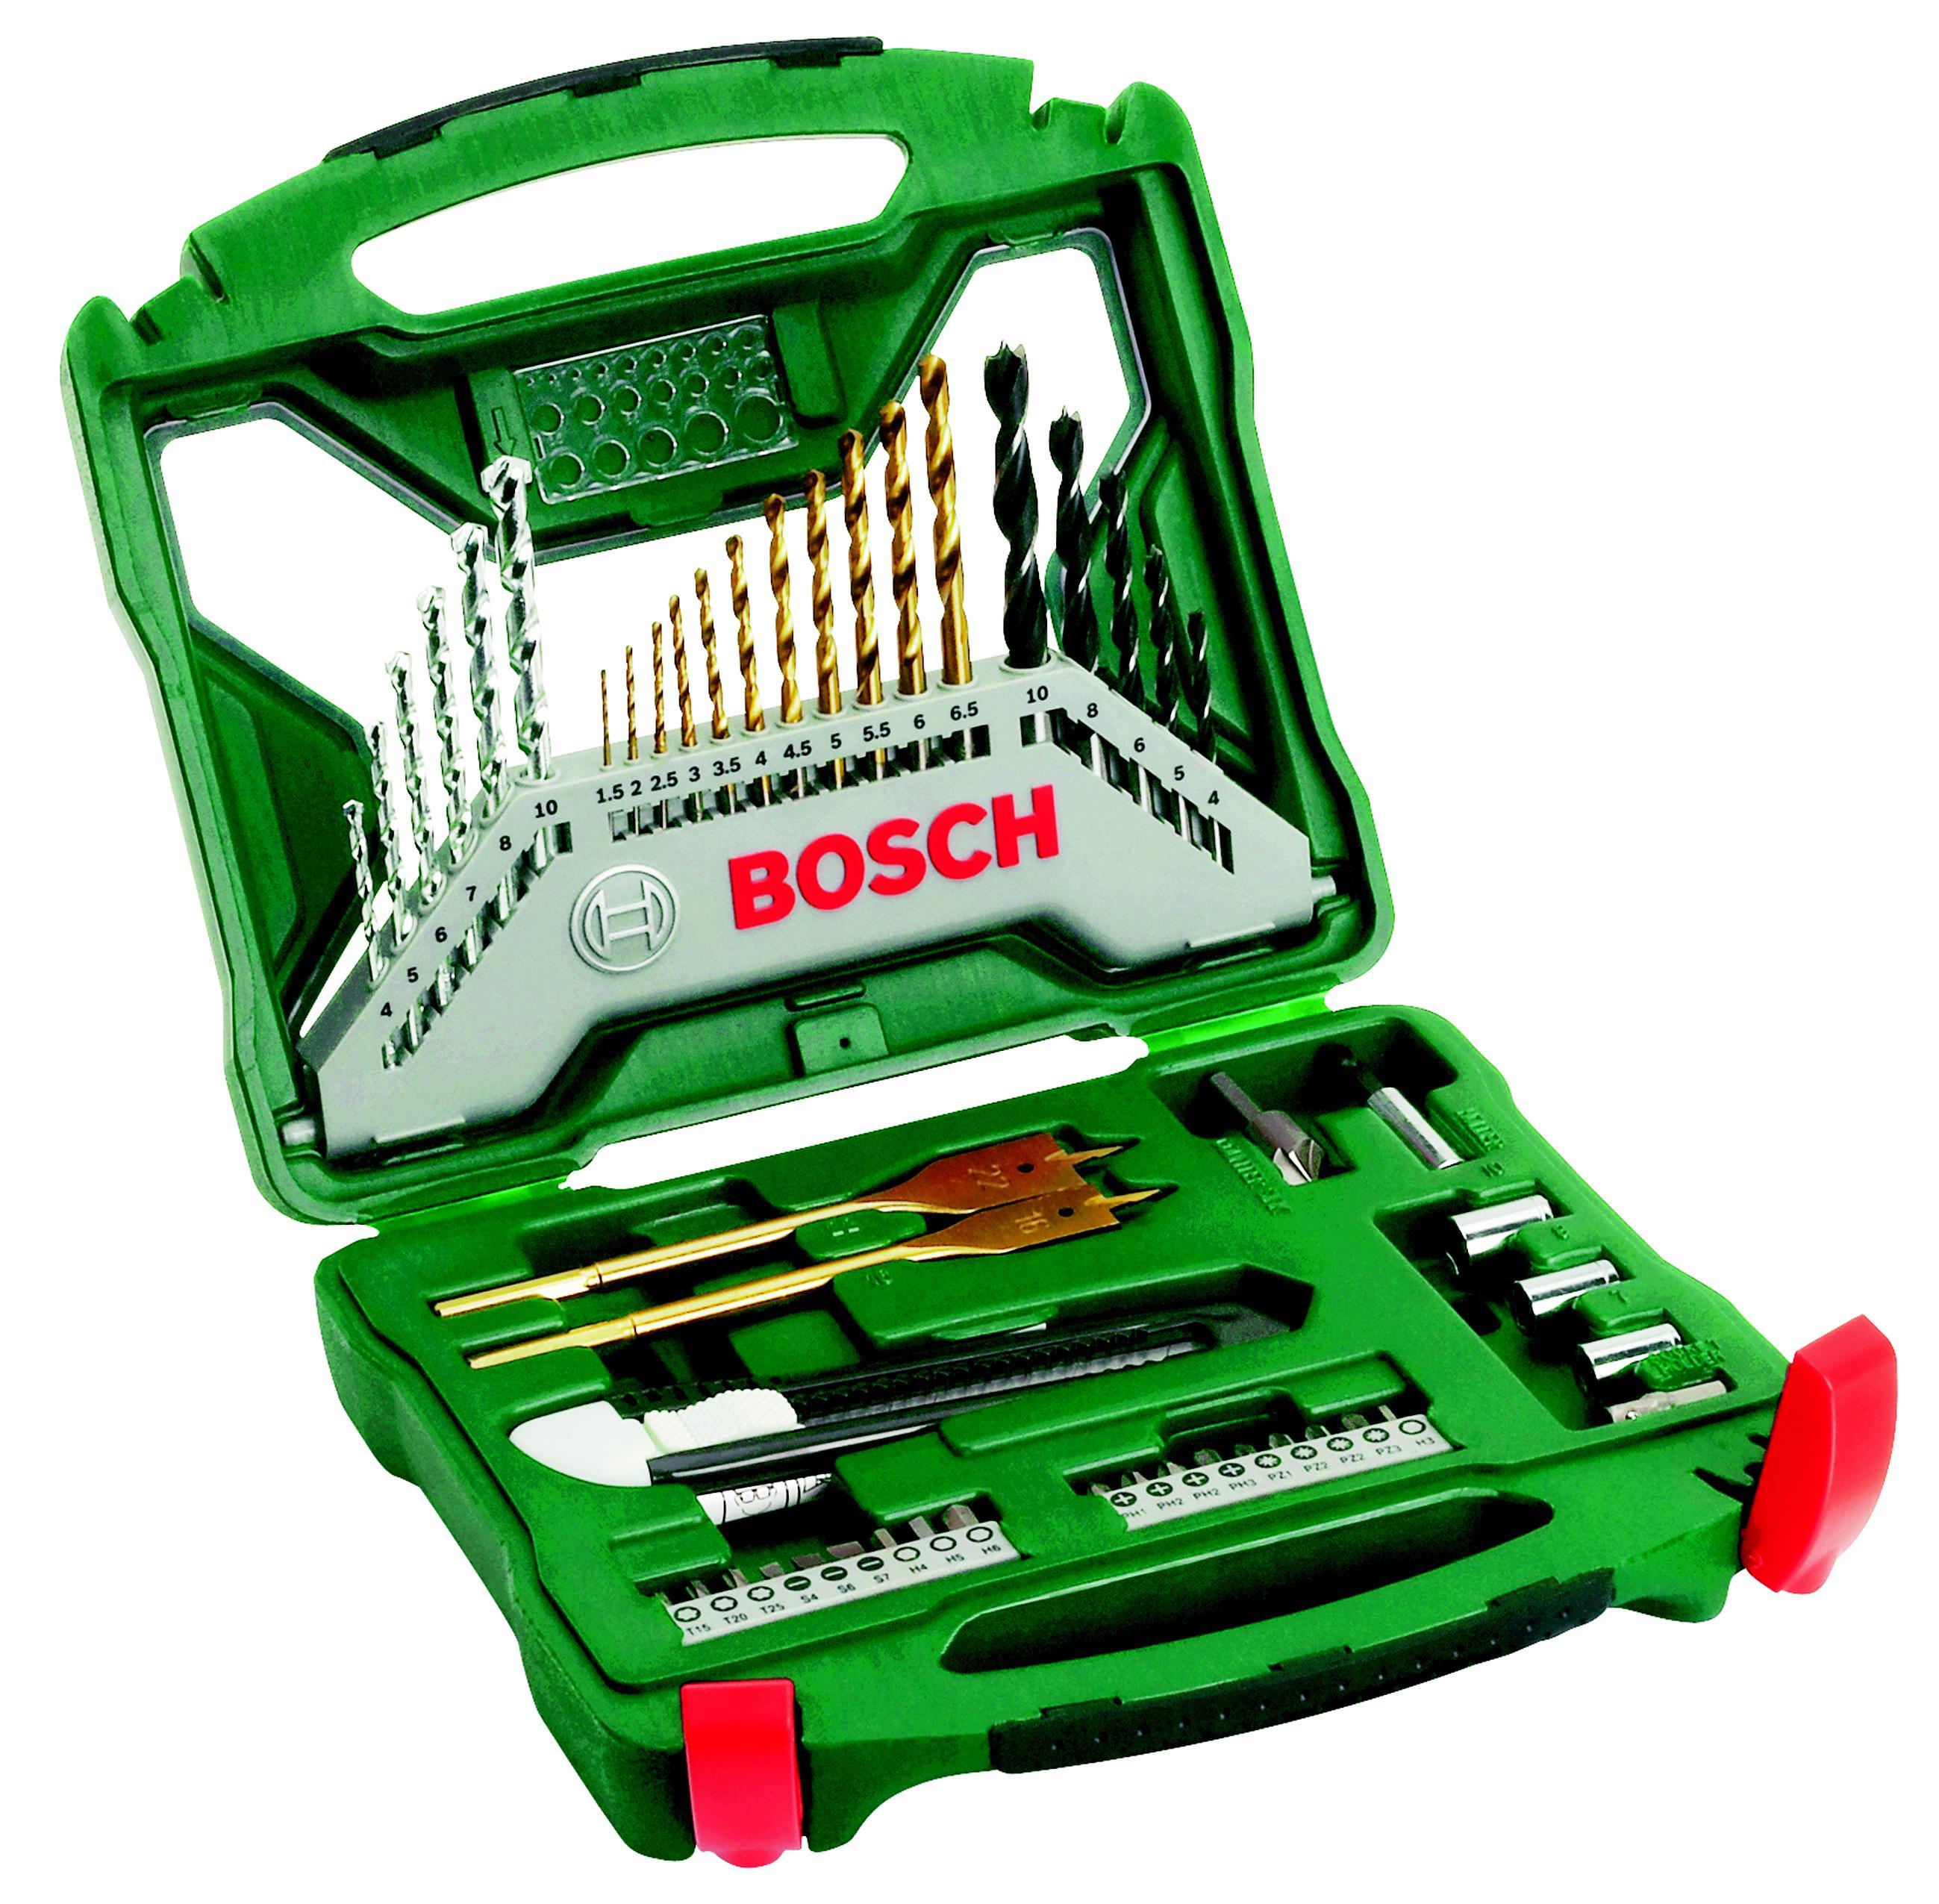 Набор бит и сверл Bosch X-line 50 titanium (2.607.019.327) набор сверл и бит bosch x line 70 70 предметов 2607019329